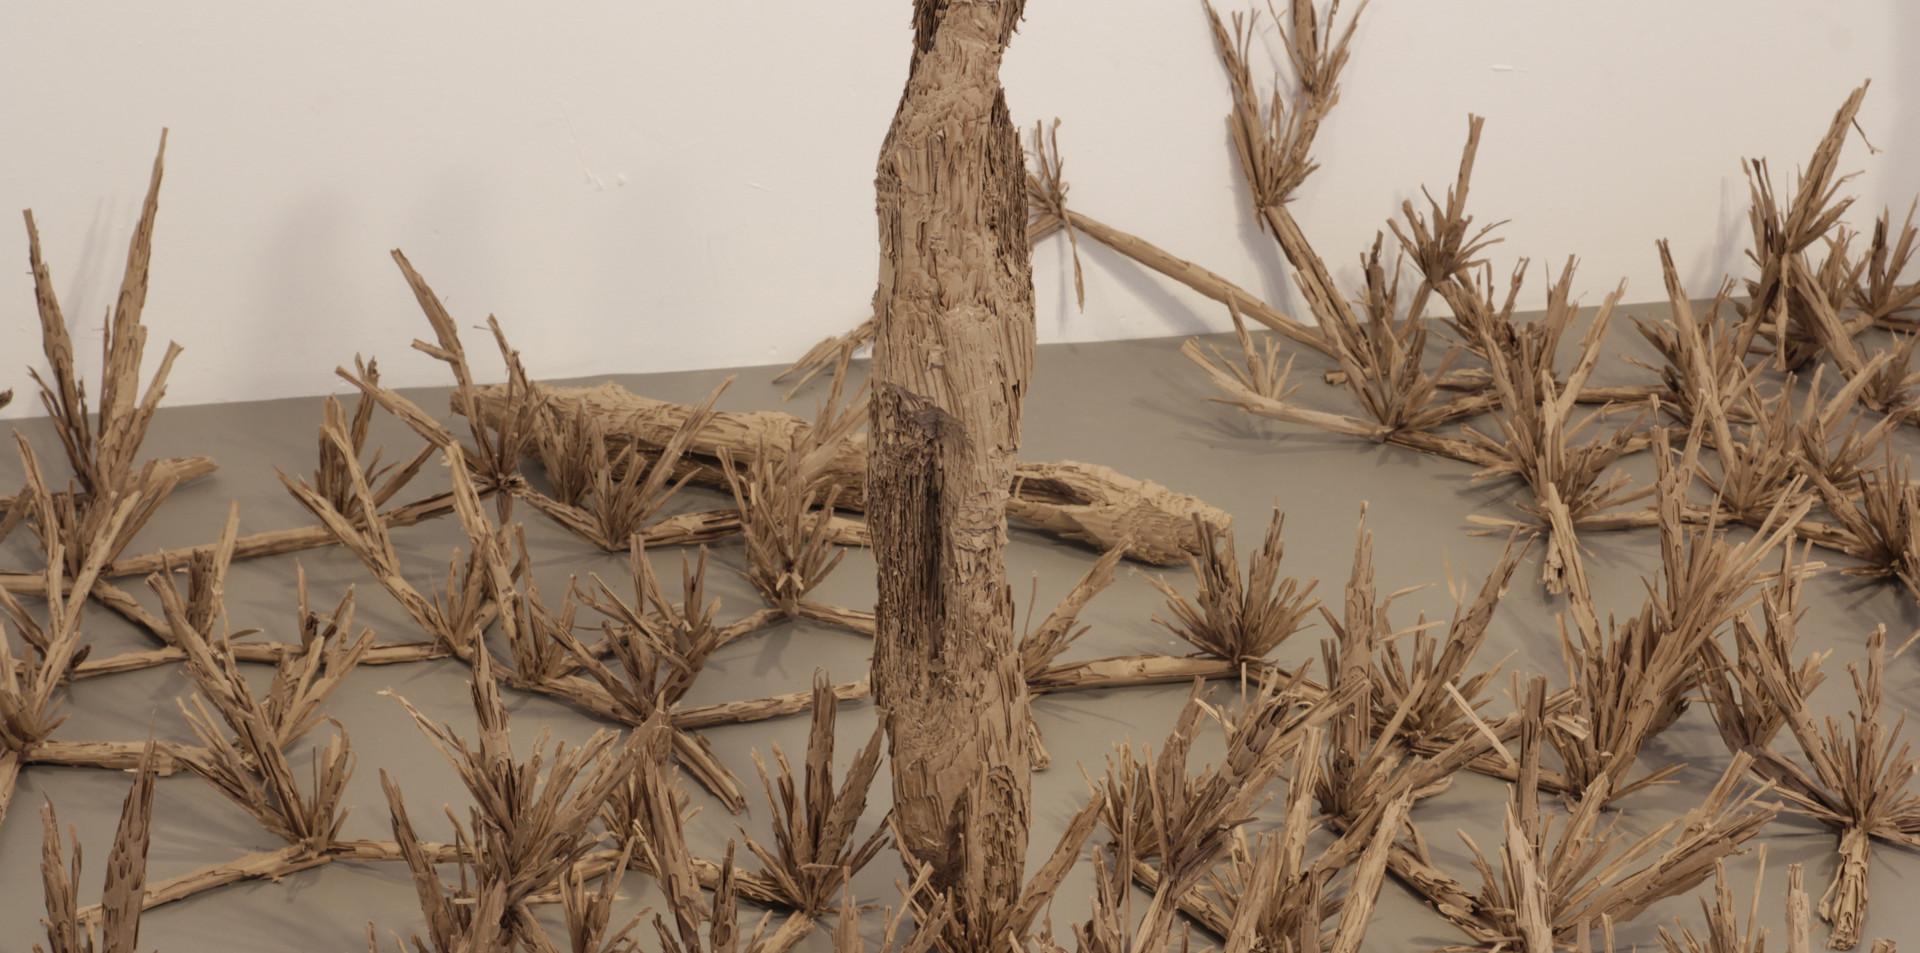 Land corrugated cardboard, 300 / 300 / 100 cm, 2017 